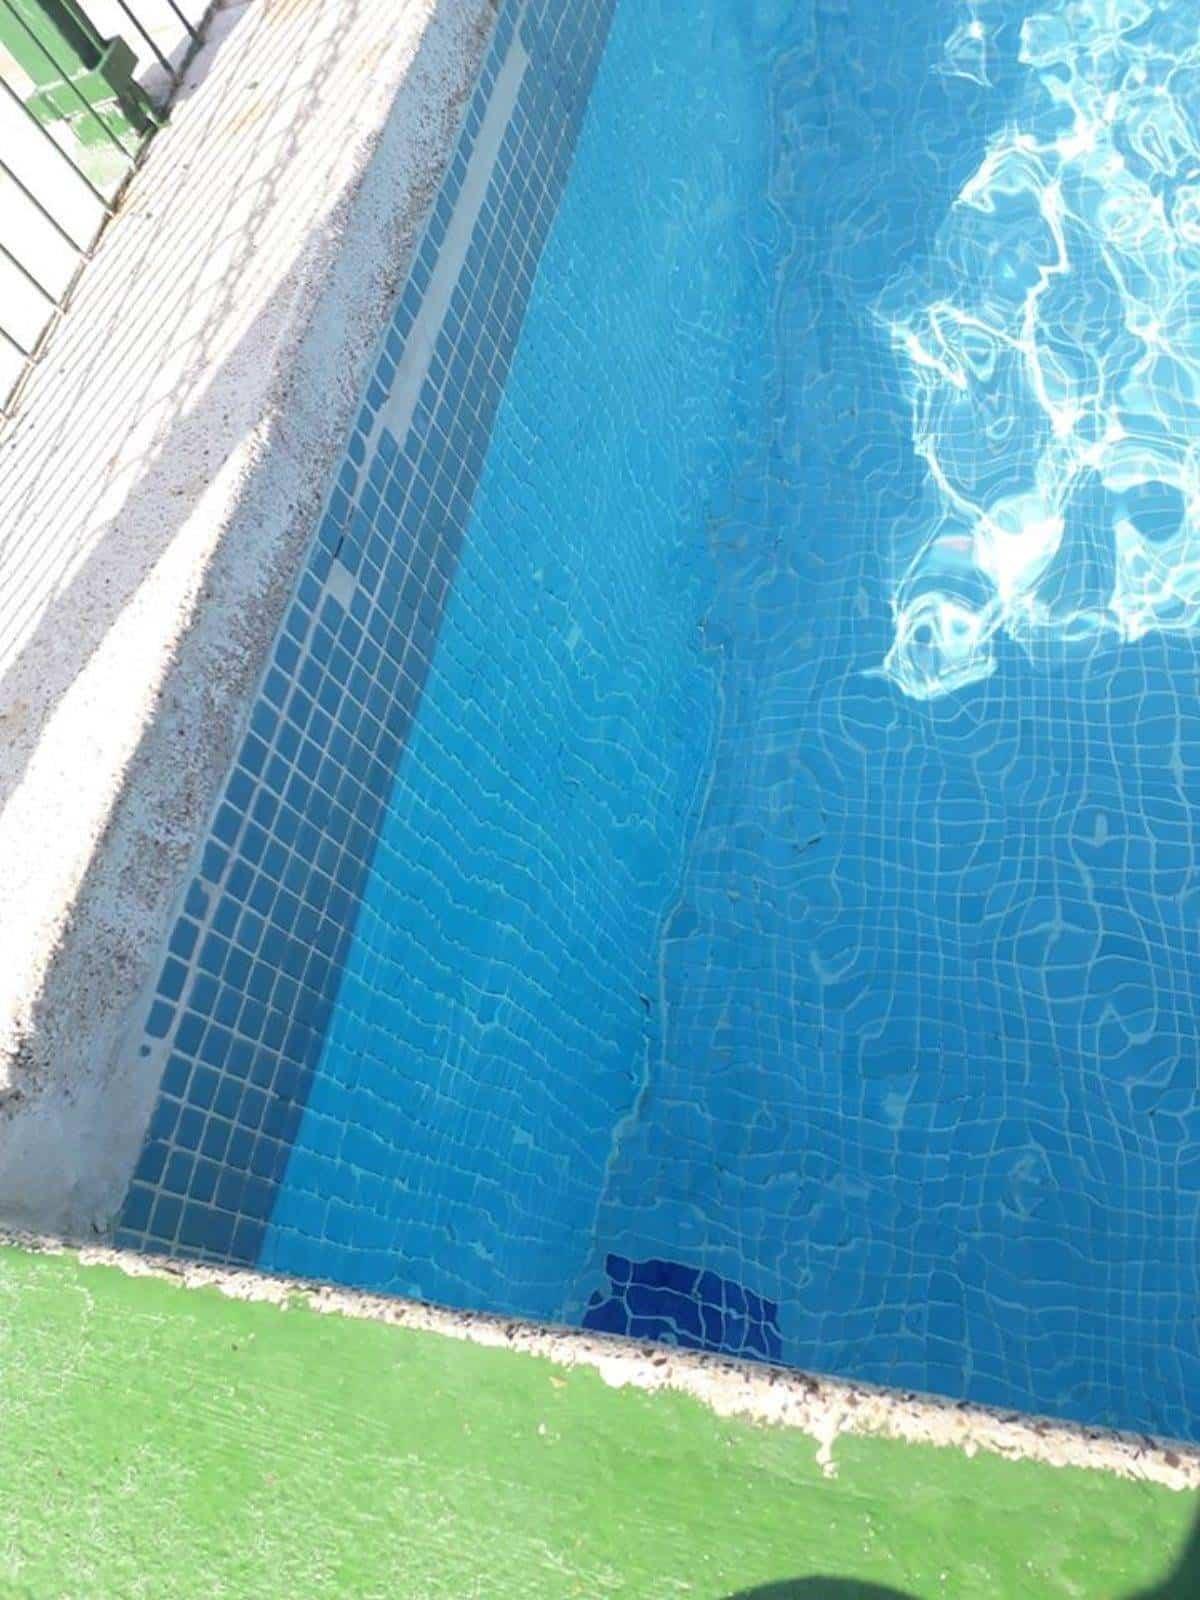 piscina municipal herencia foto psoe - PSOE responde al PP sobre el estado de la Piscina Municipal de Herencia